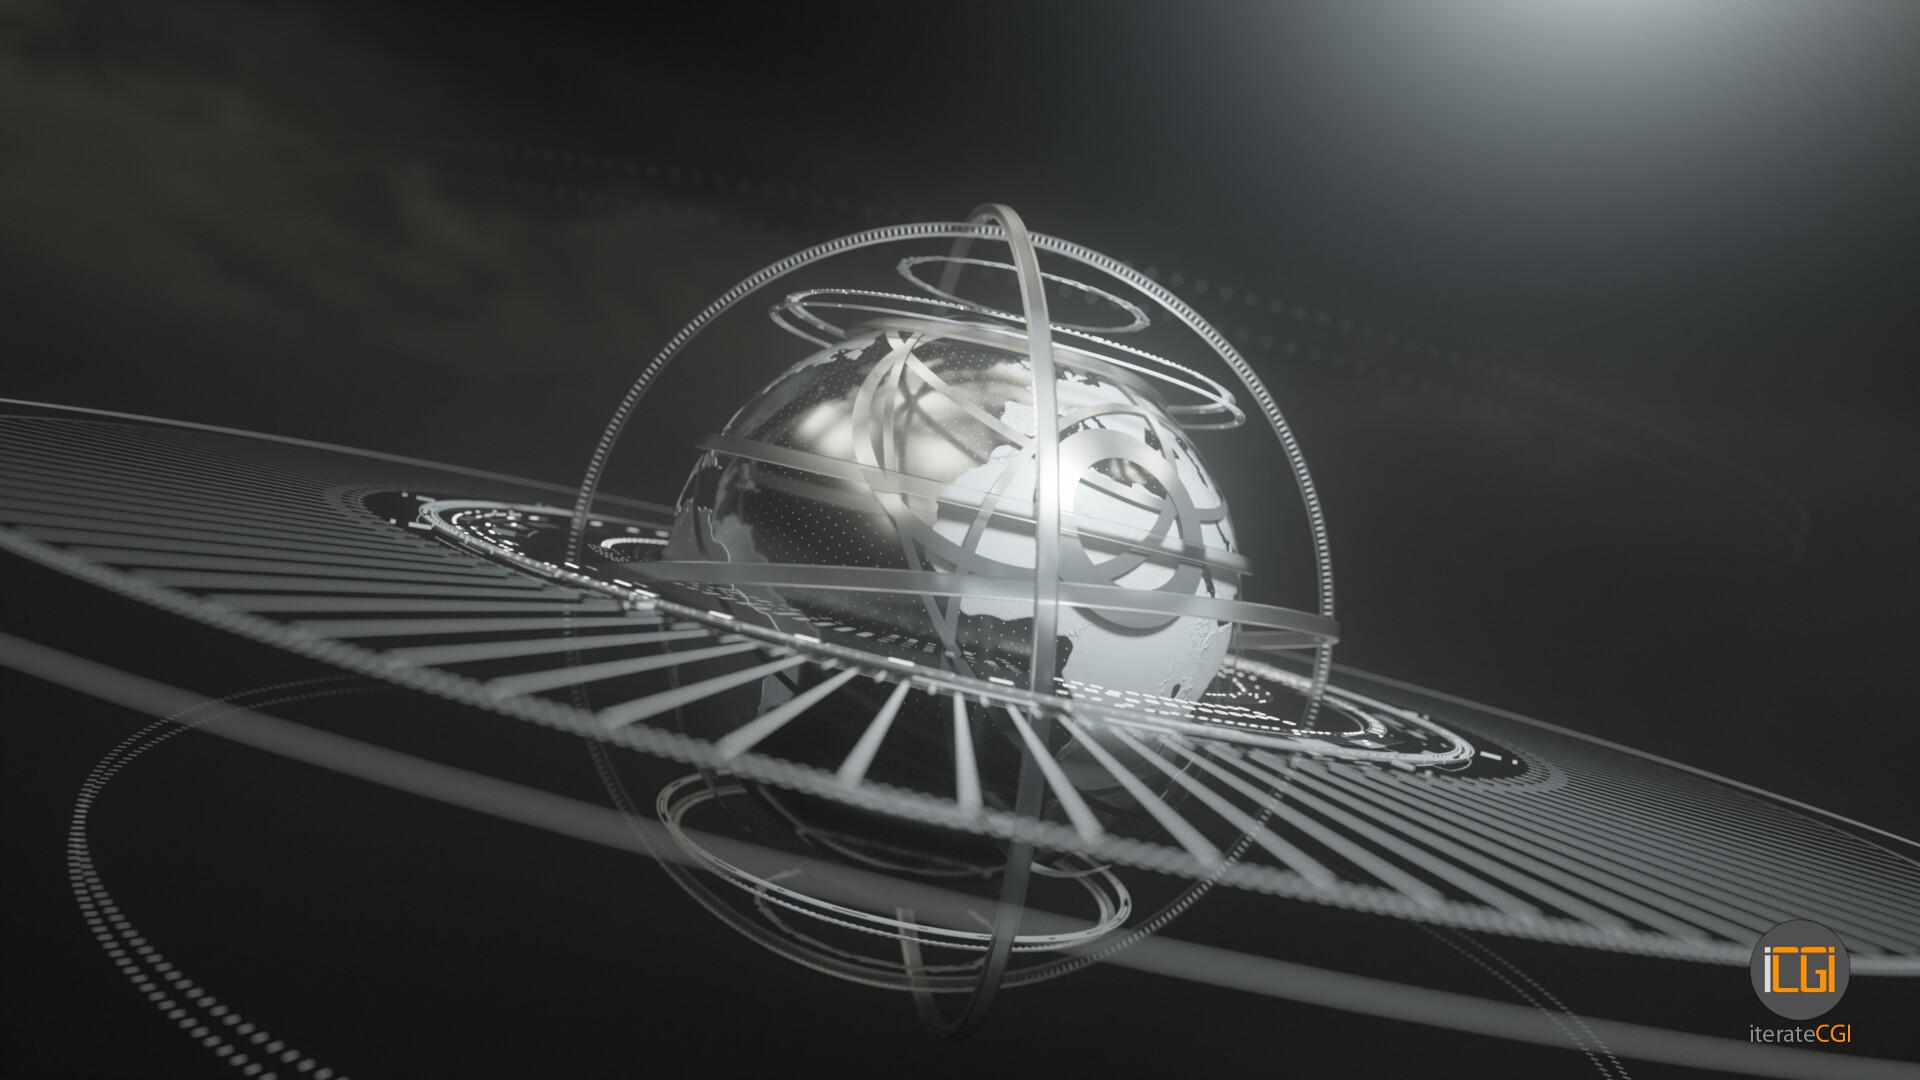 Johan de leenheer globe motion graphic 12